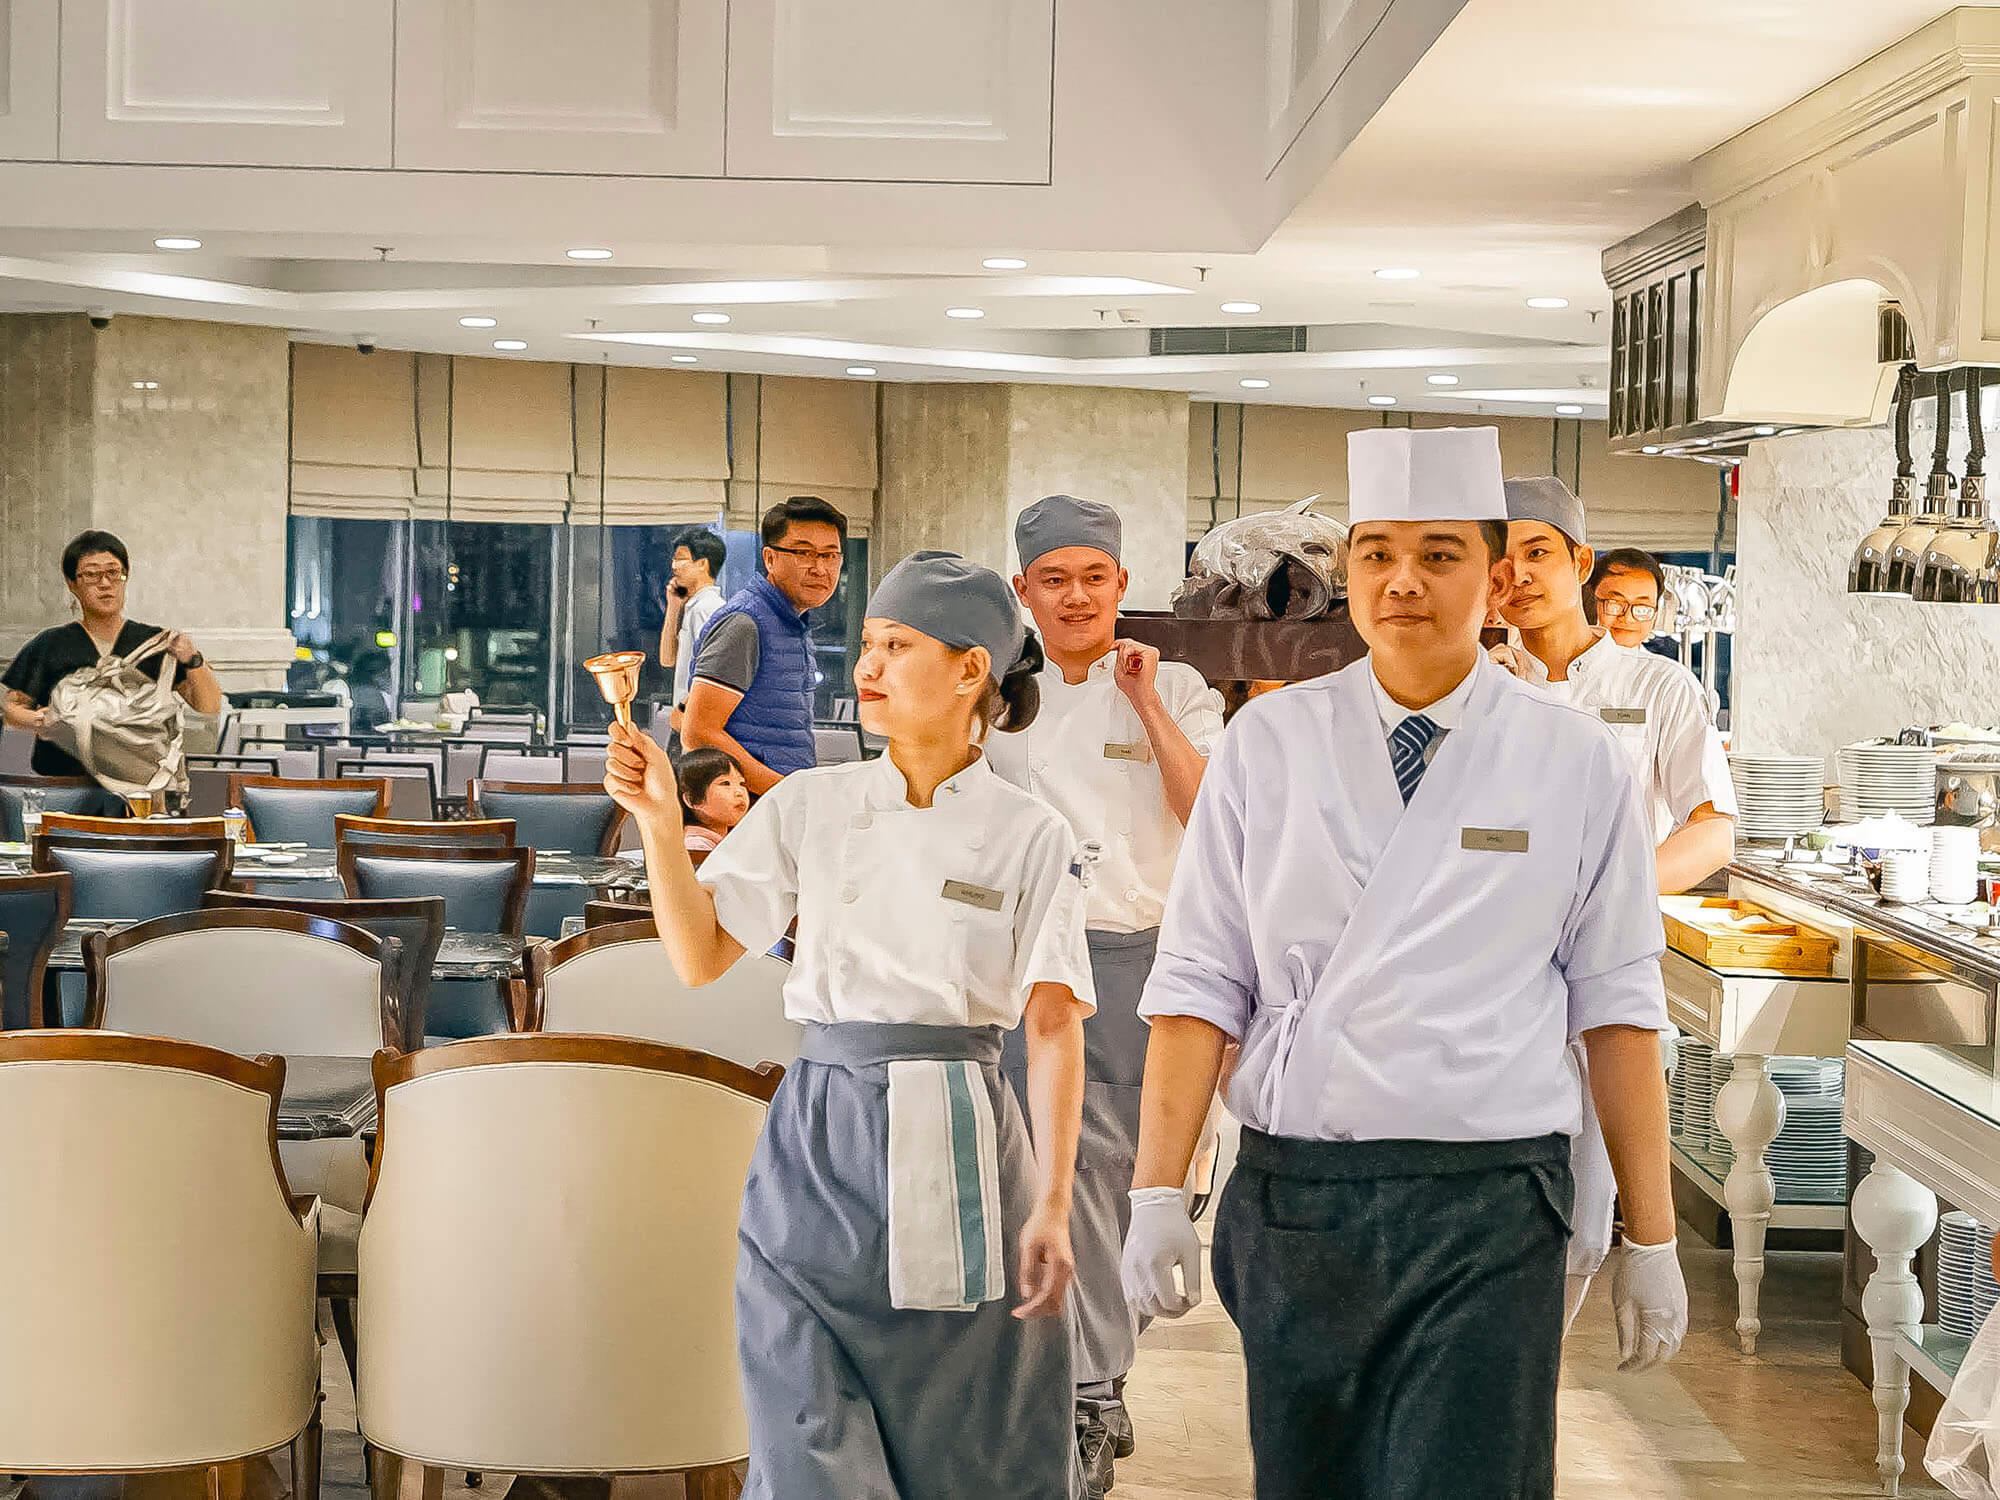 Man Nhan Dai Tiec Buffet Nhat Ban Voi Phan Trinh Dien Tuna Cutting Doc Dao Tai Four Points By Sheraton Danang 010